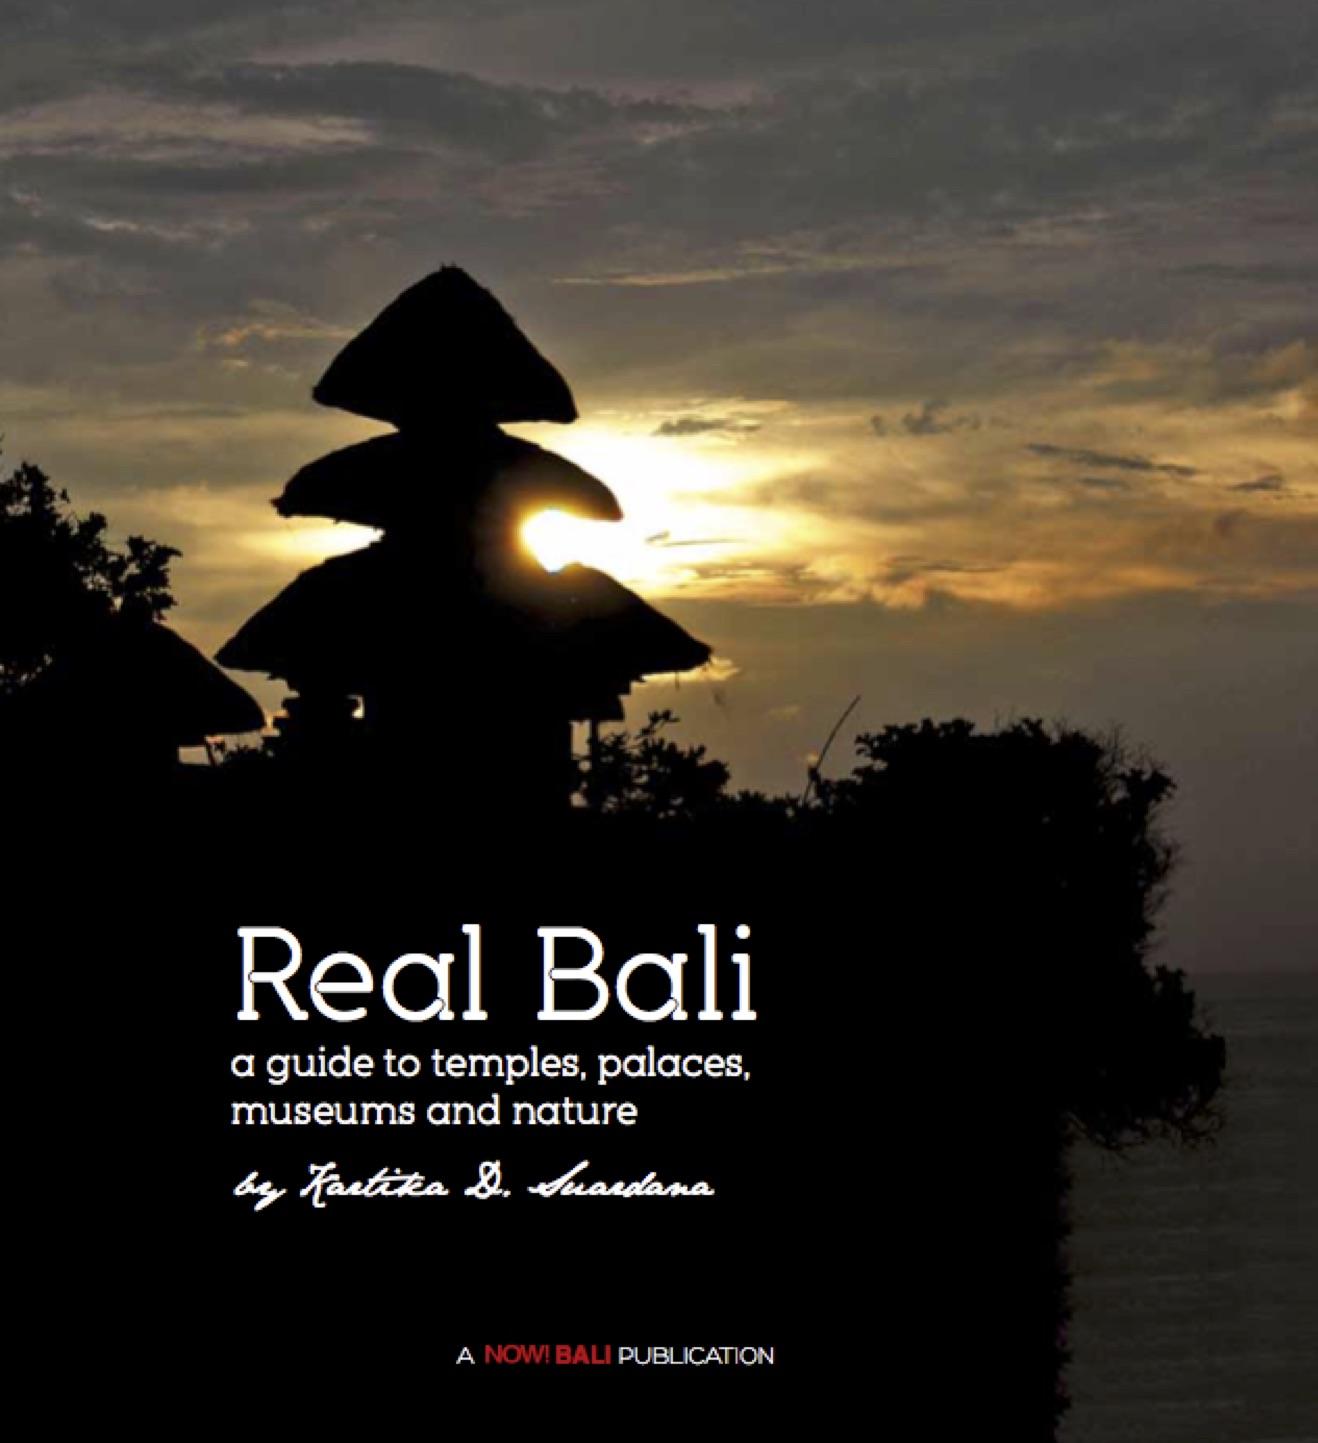 Real Bali Book - books about Bali